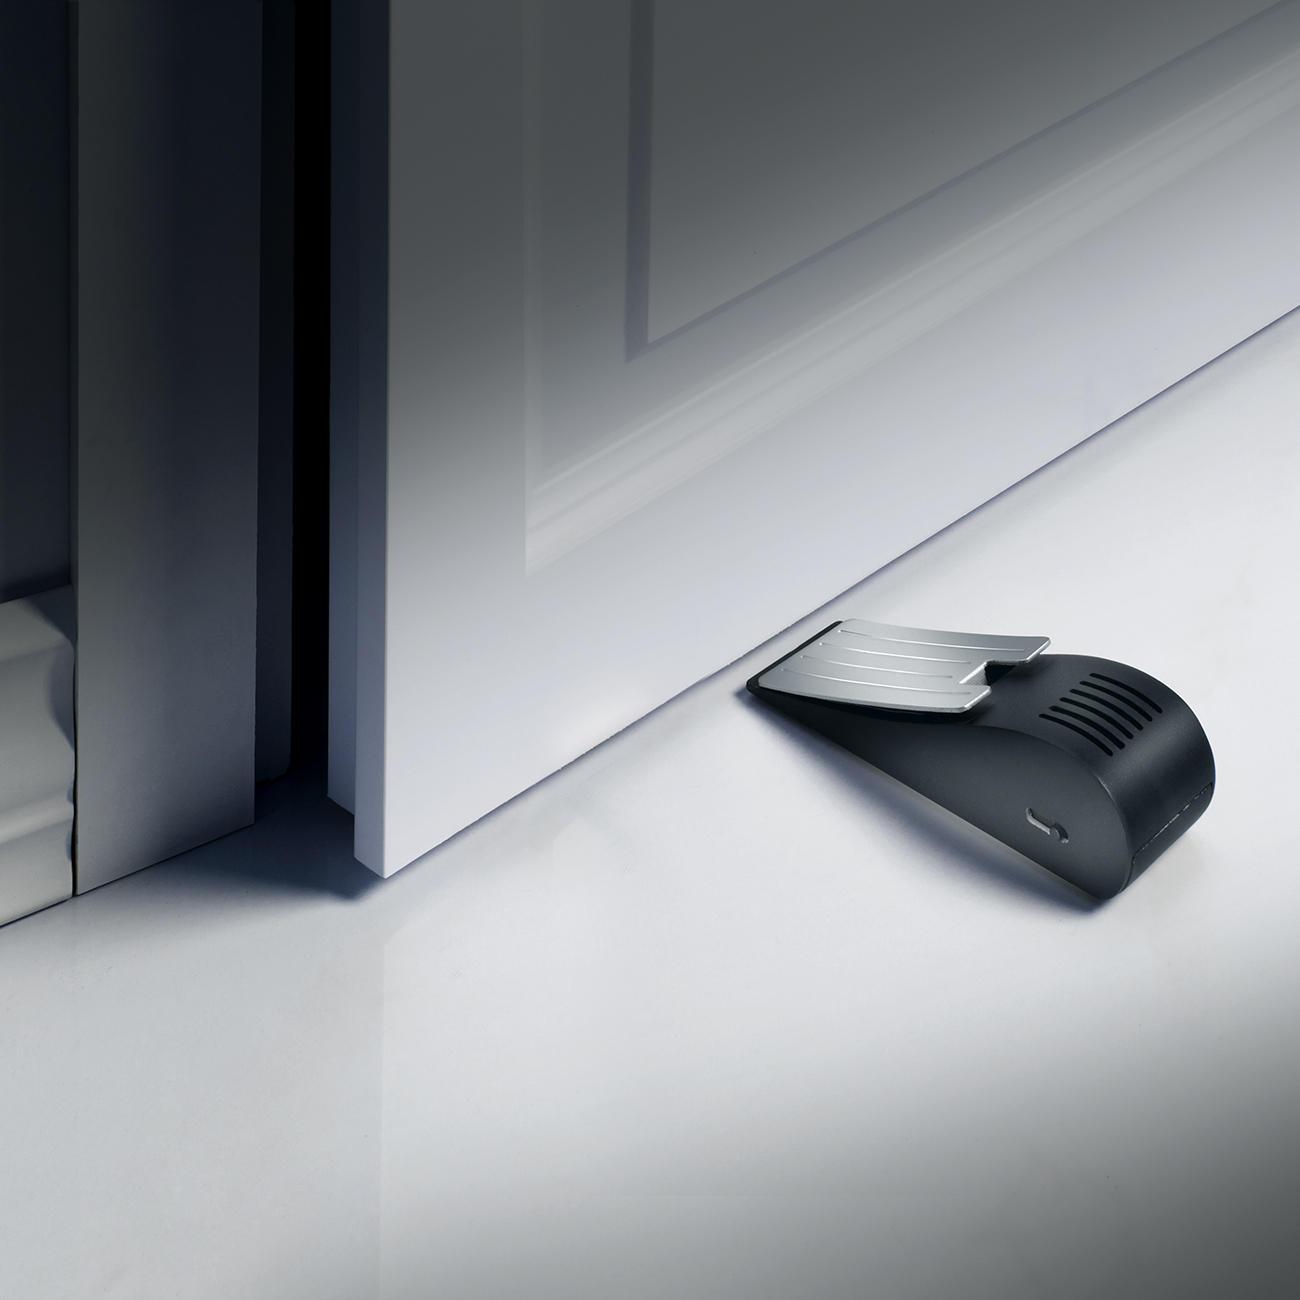 cale porte avec alarme garantie produit de 3 ans. Black Bedroom Furniture Sets. Home Design Ideas